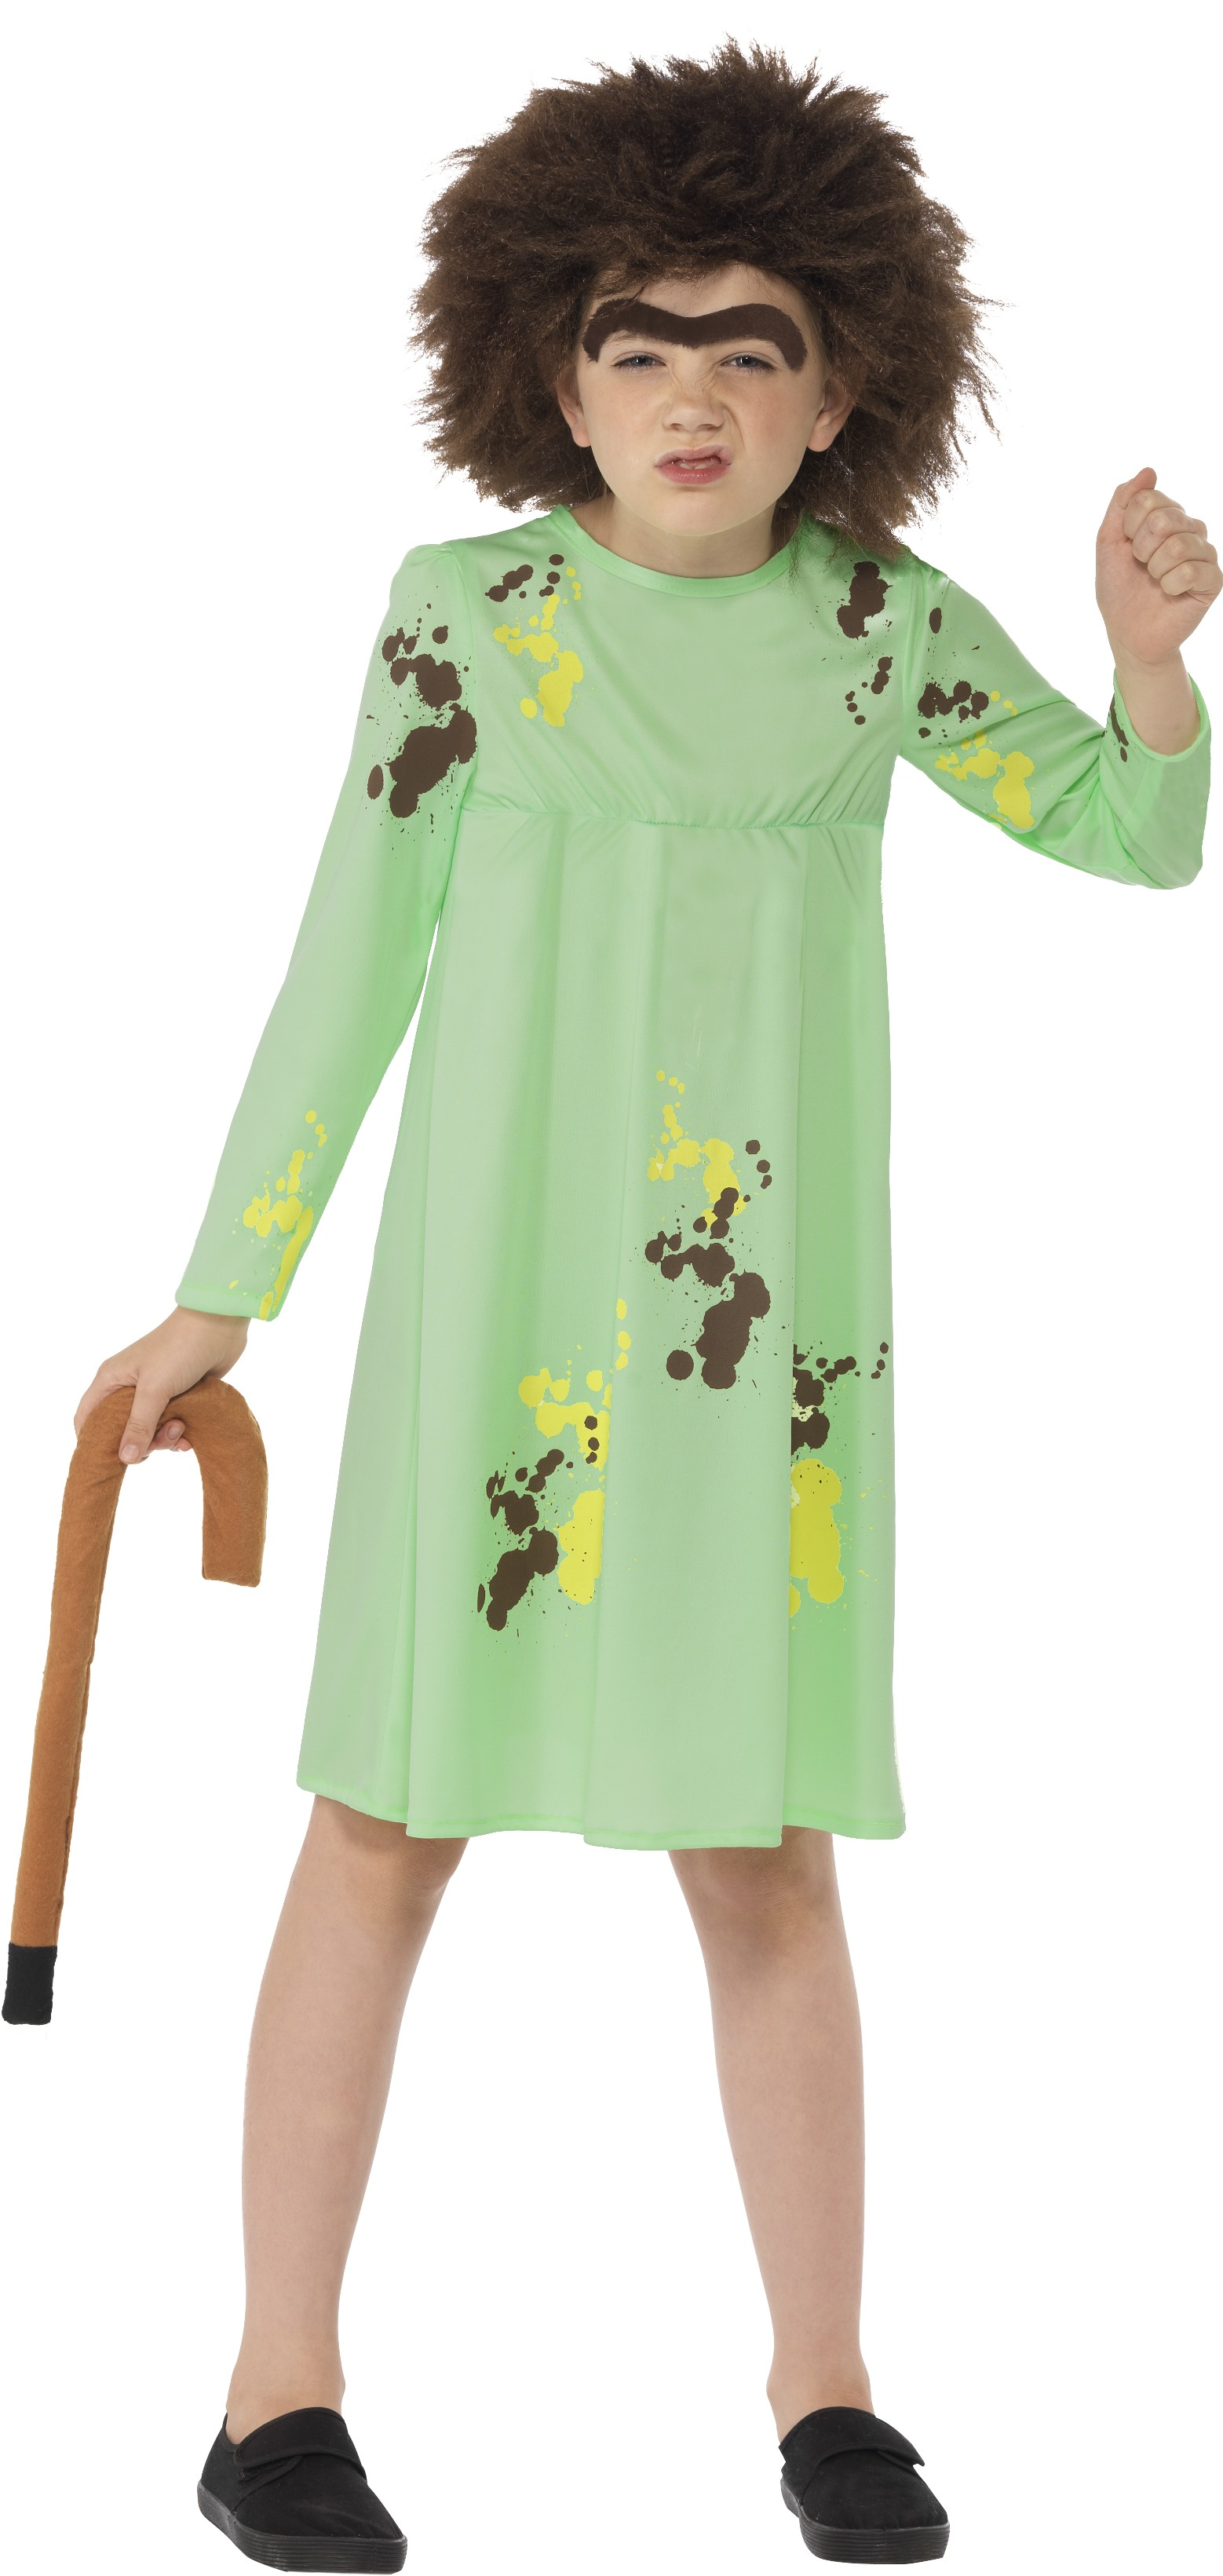 Roald Dahl Mrs Twit Girls Costume